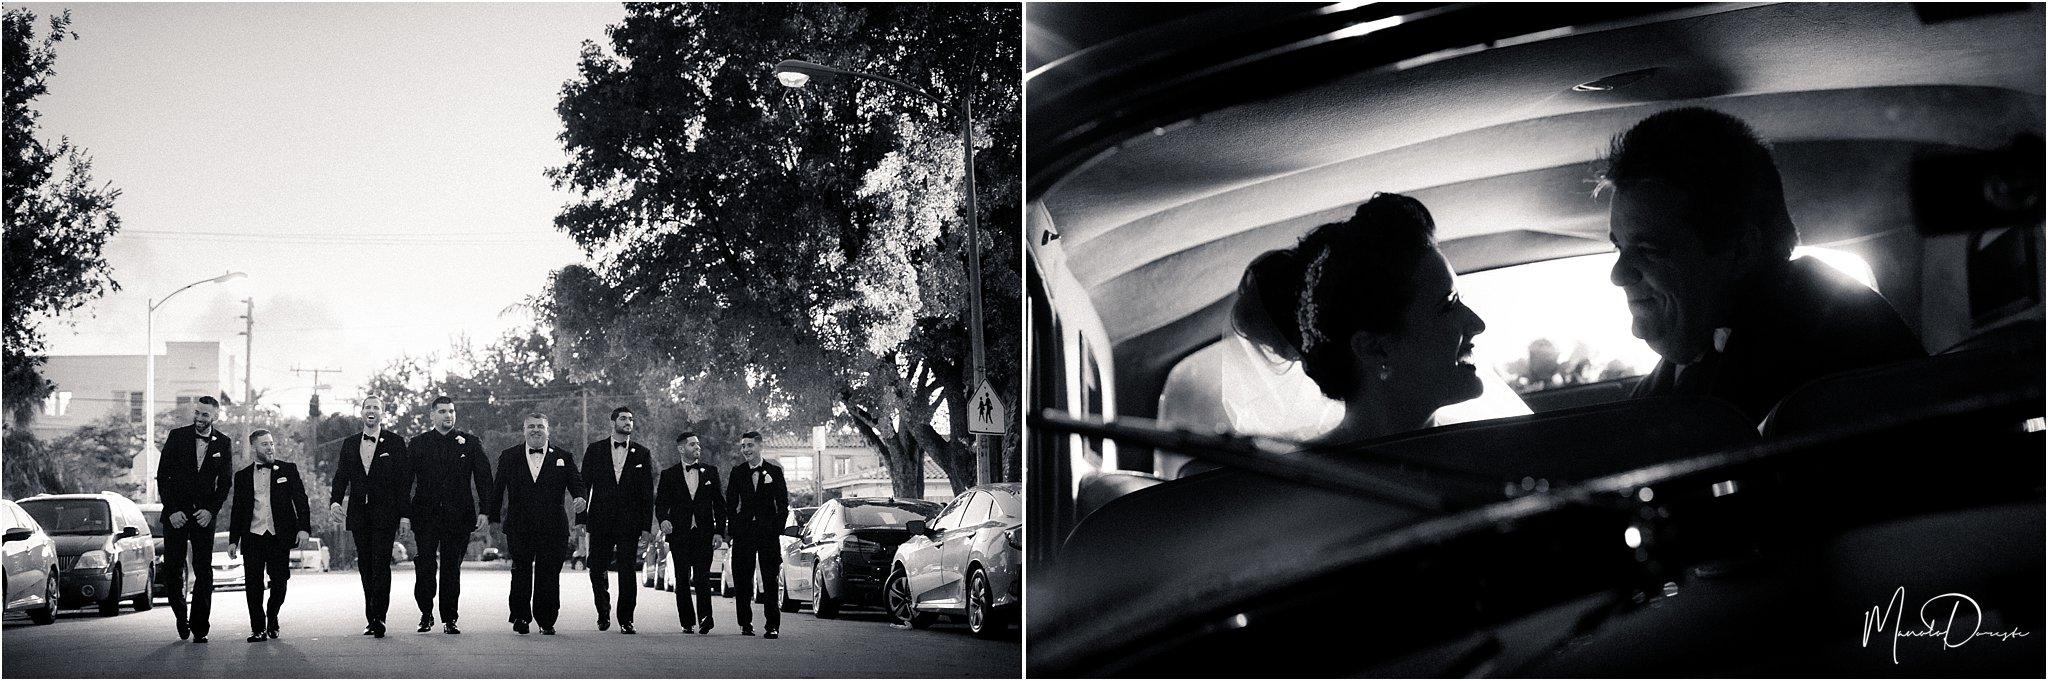 00959_ManoloDoreste_InFocusStudios_Wedding_Family_Photography_Miami_MiamiPhotographer.jpg